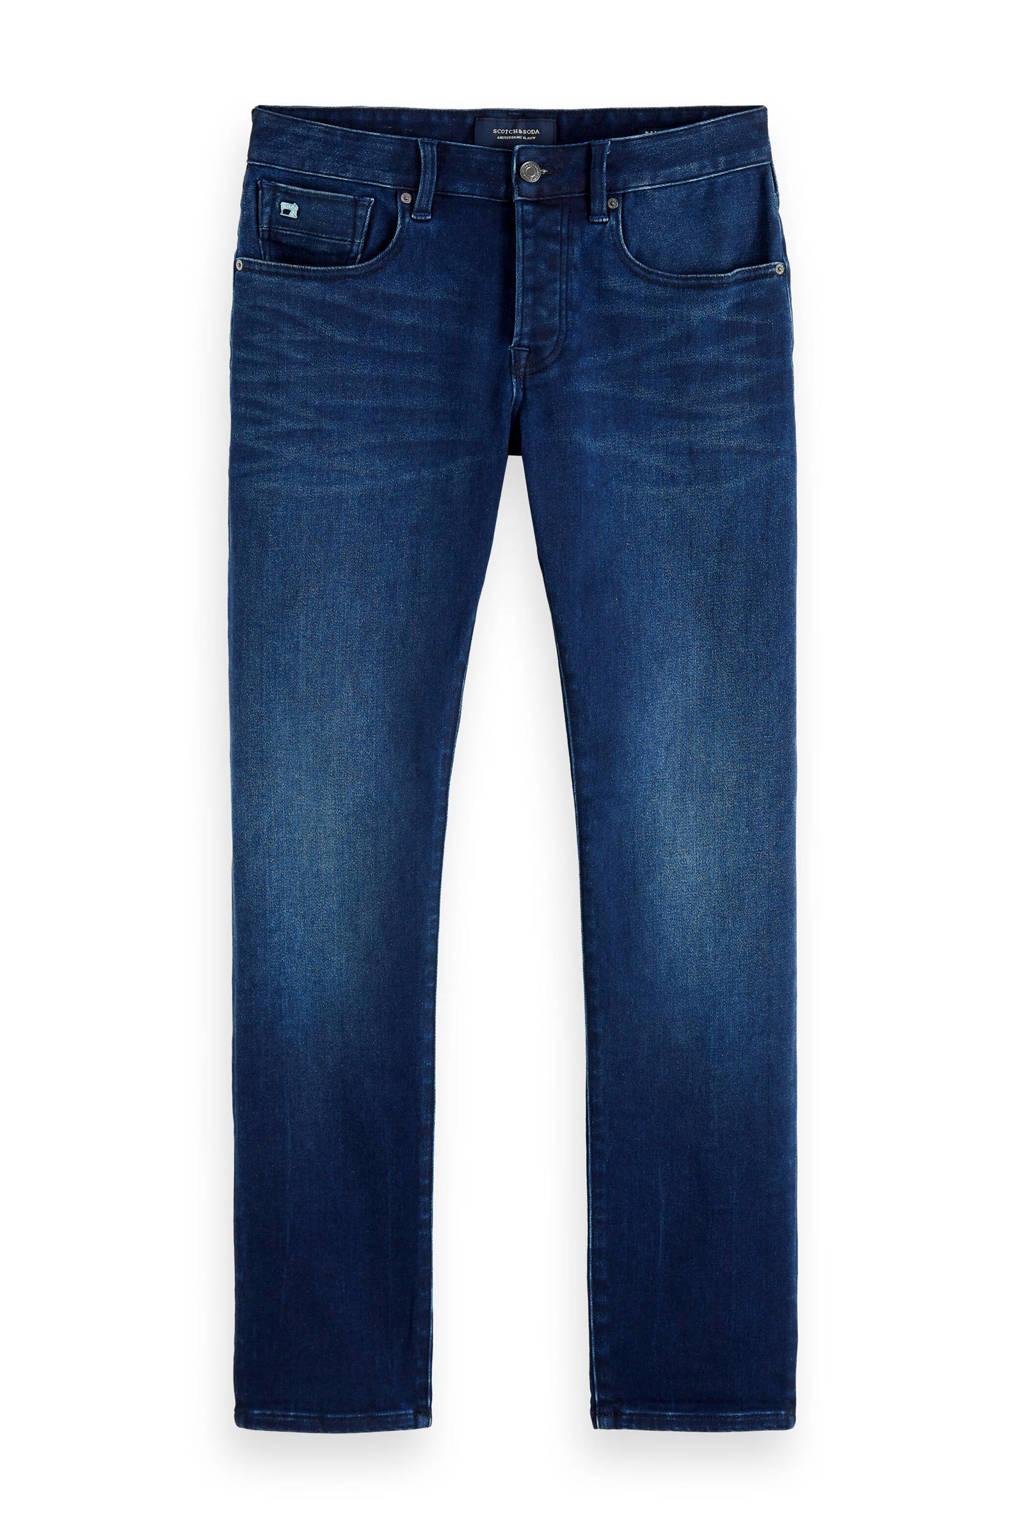 Scotch & Soda slim fit jeans Ralston blue image, Blue Image